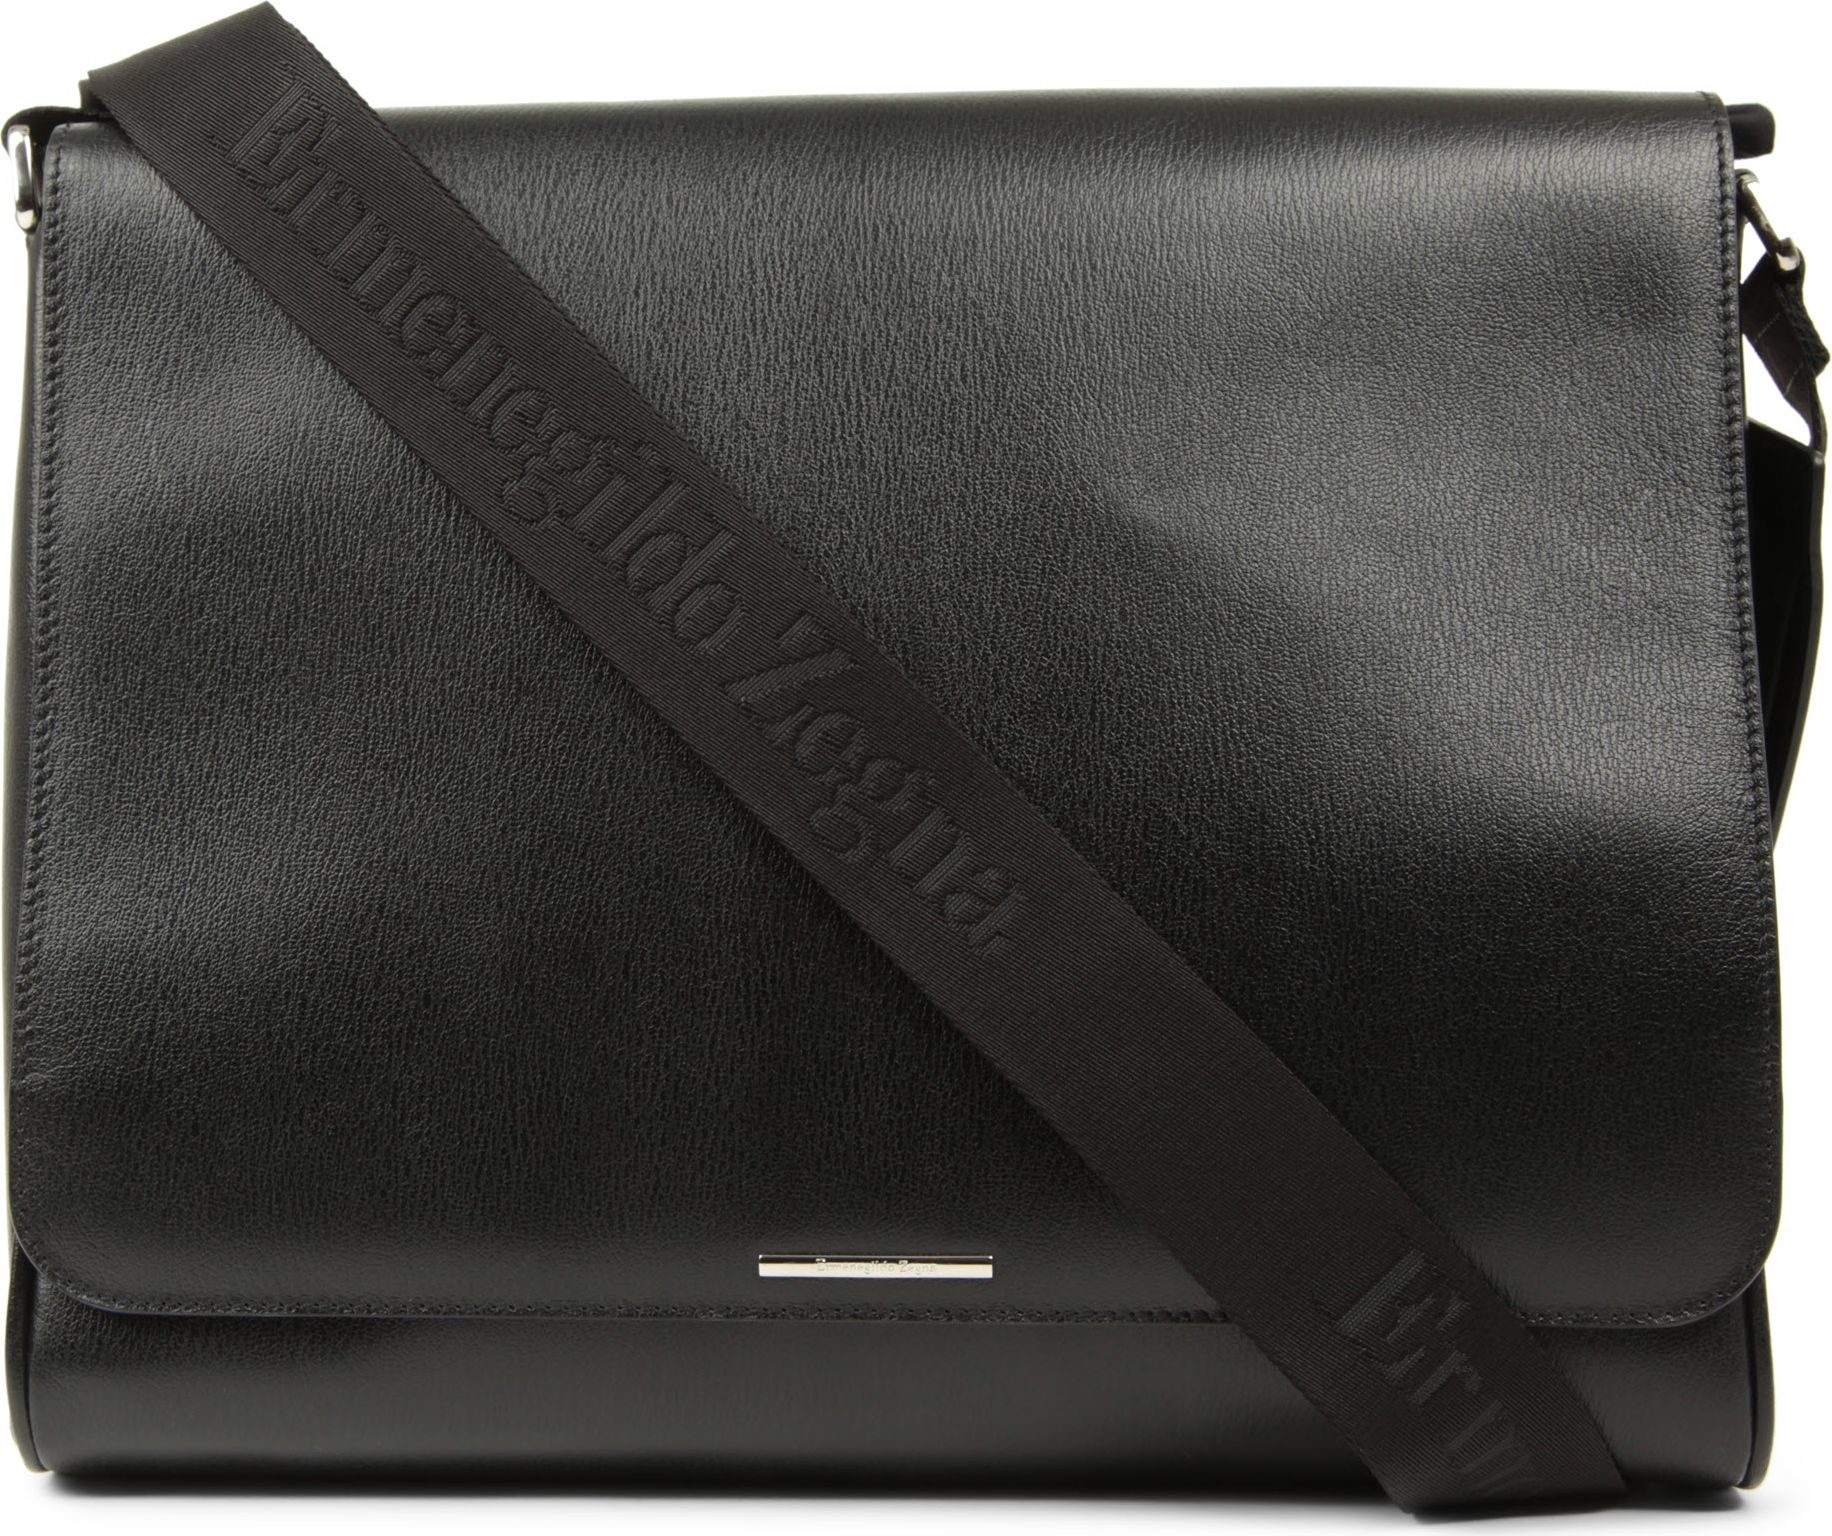 6d9d634a Ermenegildo Zegna Heritage Leather Messenger Bag in Black for Men - Lyst